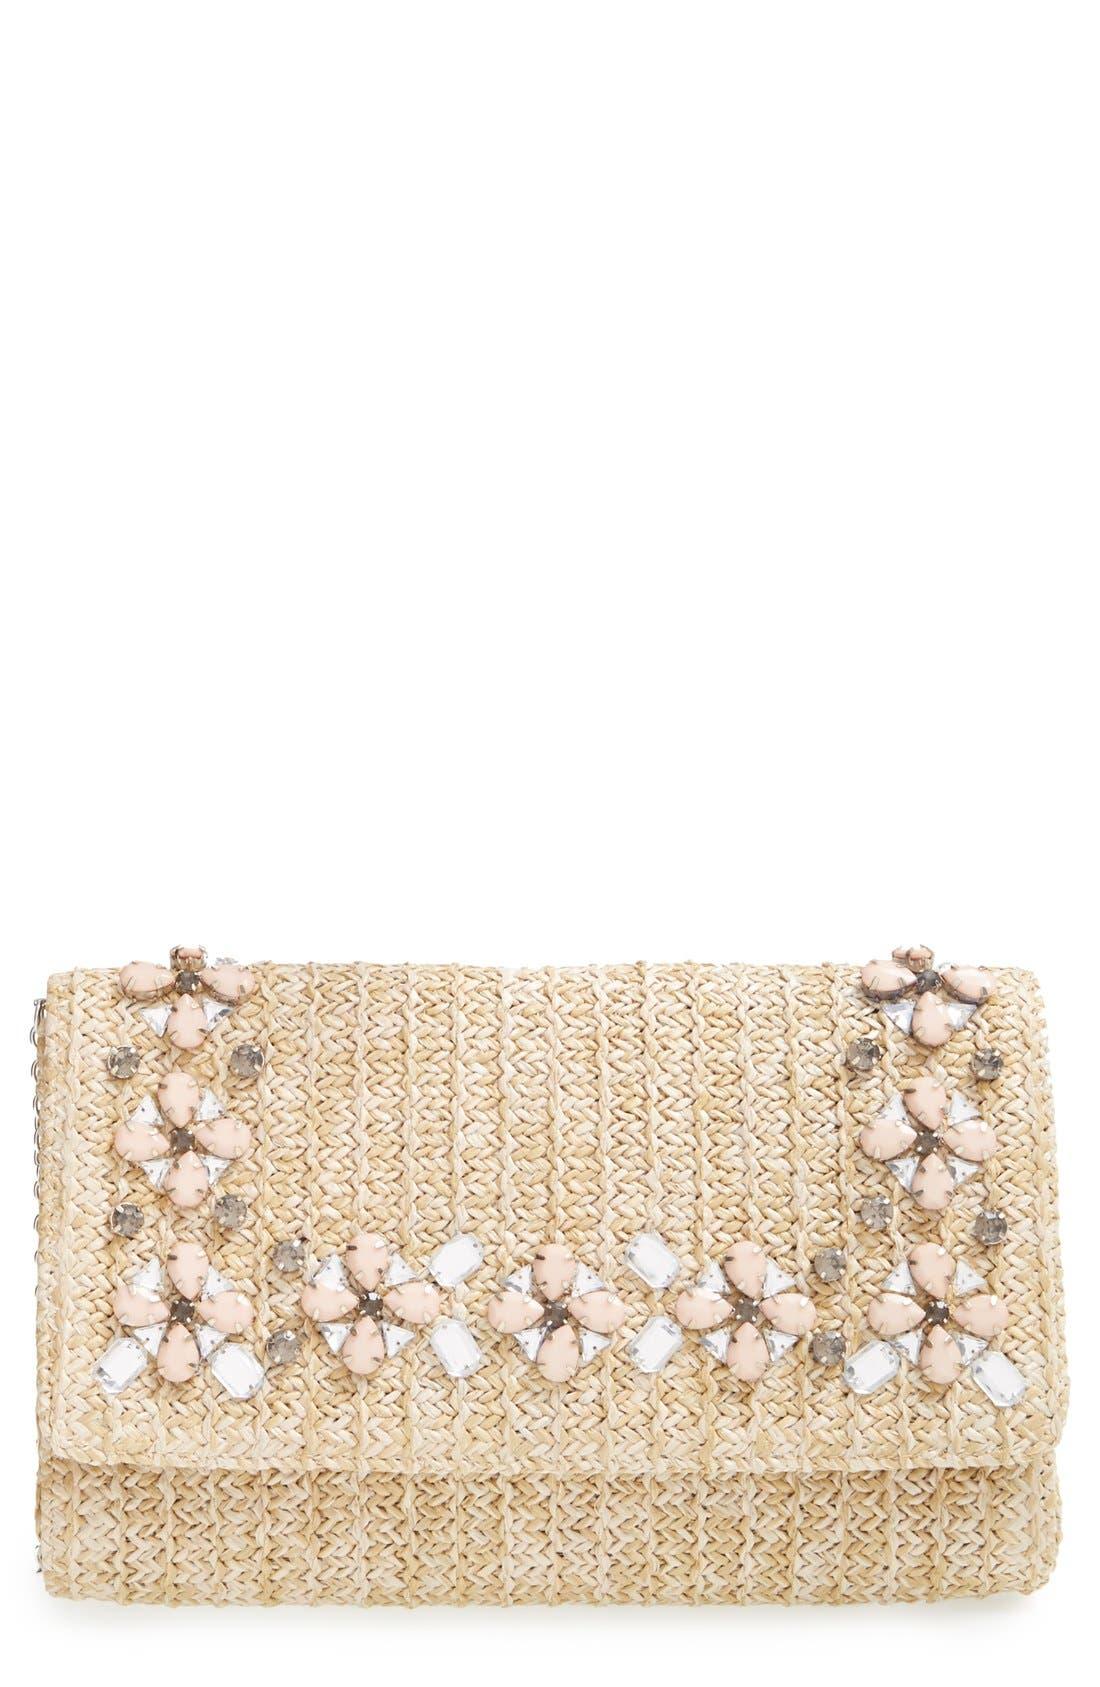 Alternate Image 1 Selected - Glint Embellished Straw Clutch